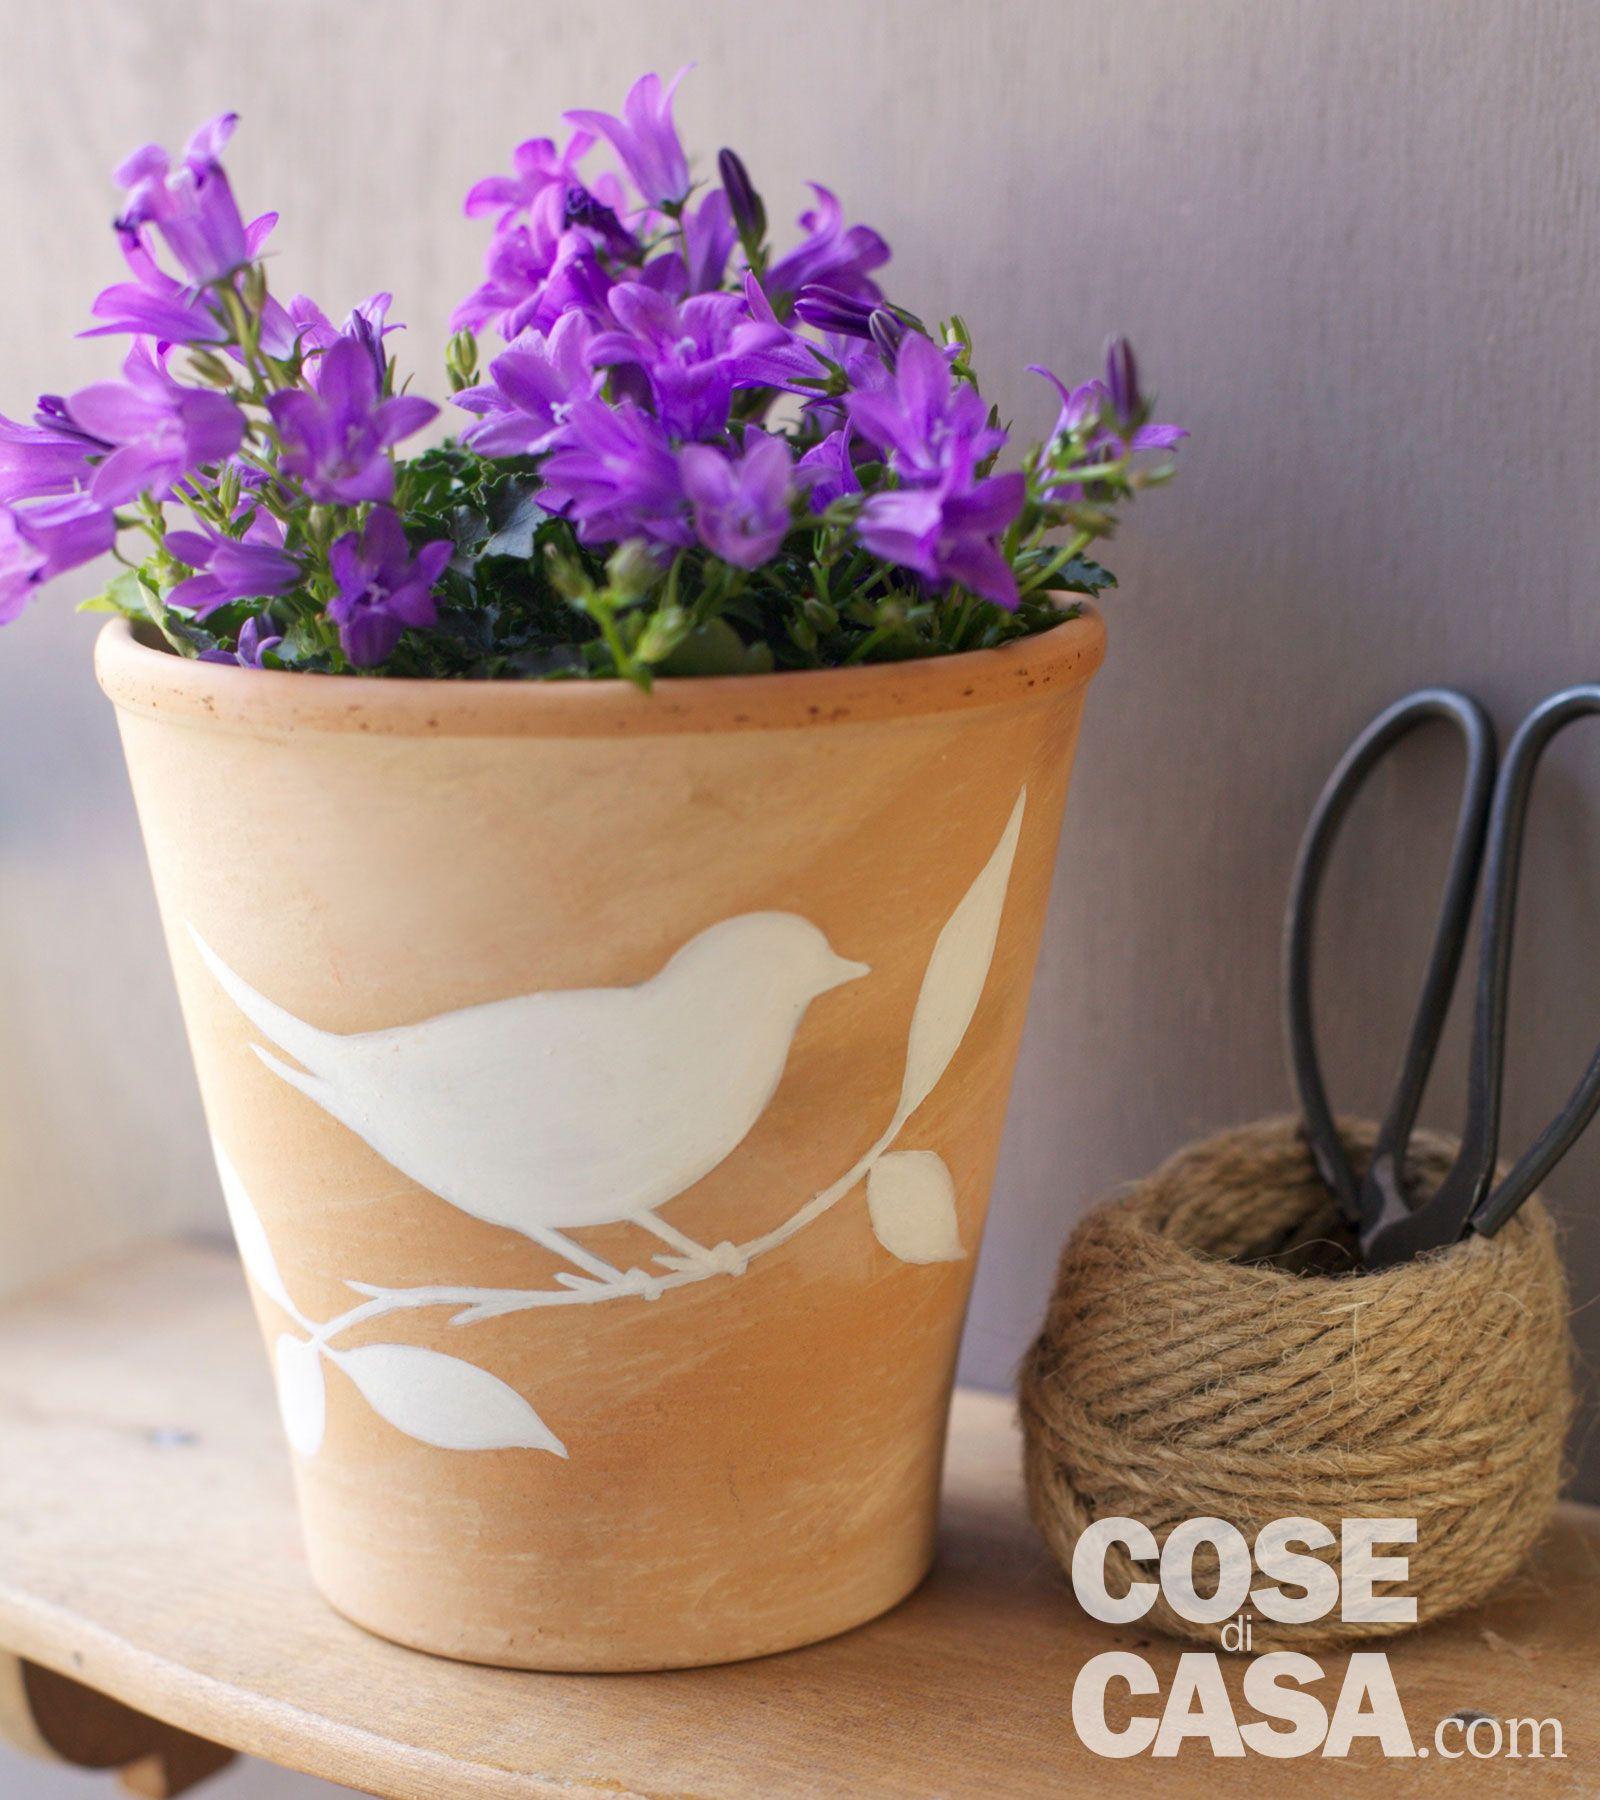 Vasi del balcone: rinnovarli e decorarli | Upcycle and Gardens